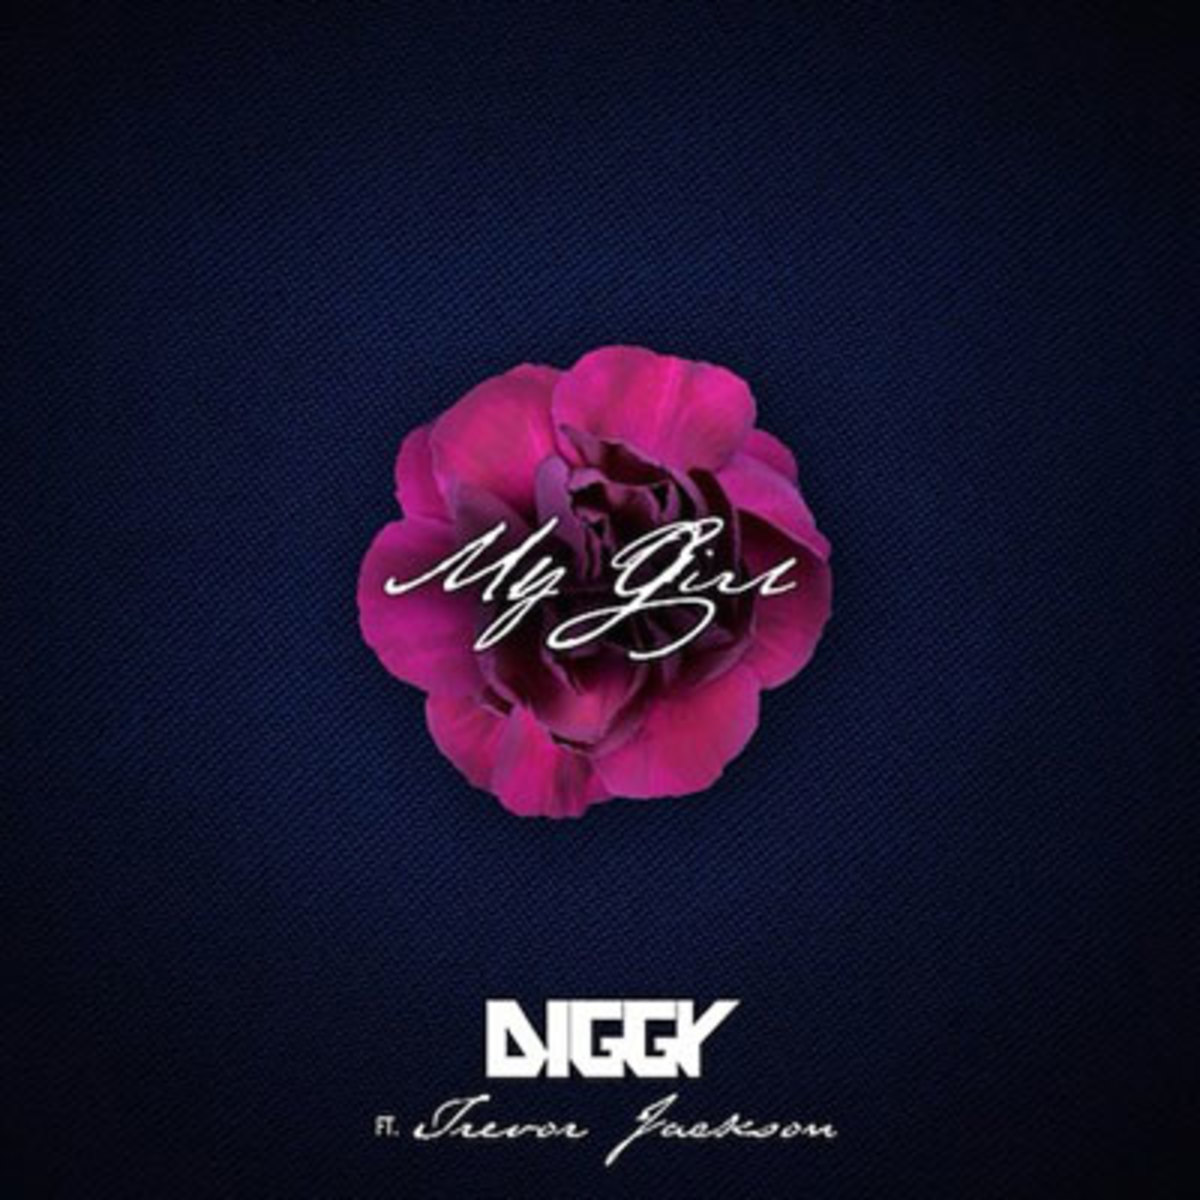 diggy-mygirl.jpg